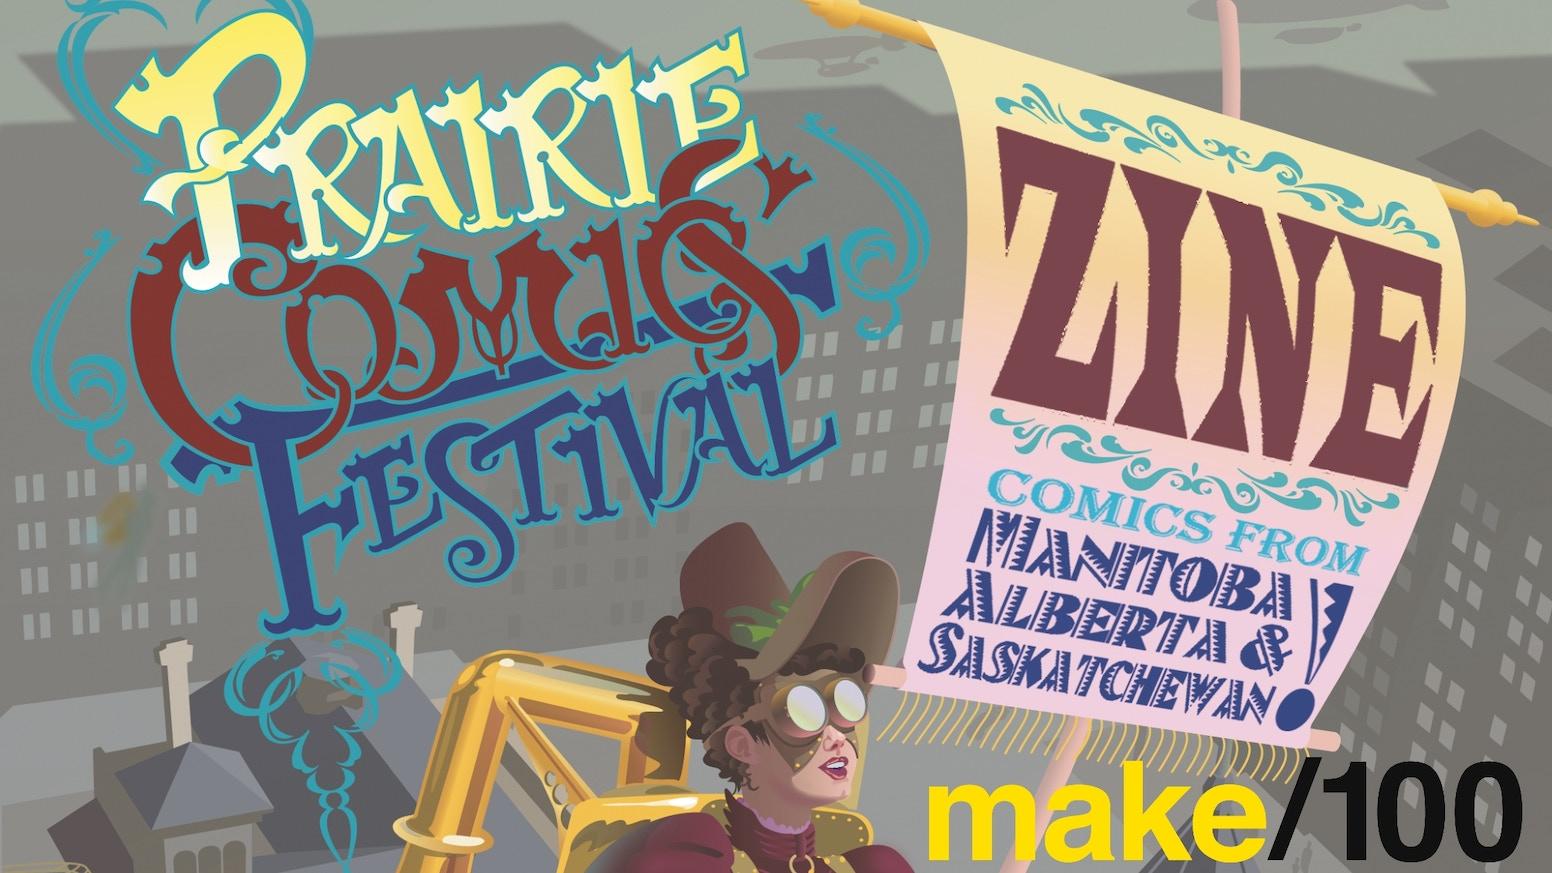 A short zine collecting comics and artwork from Manitoba, Saskatchewan, and Alberta creators!